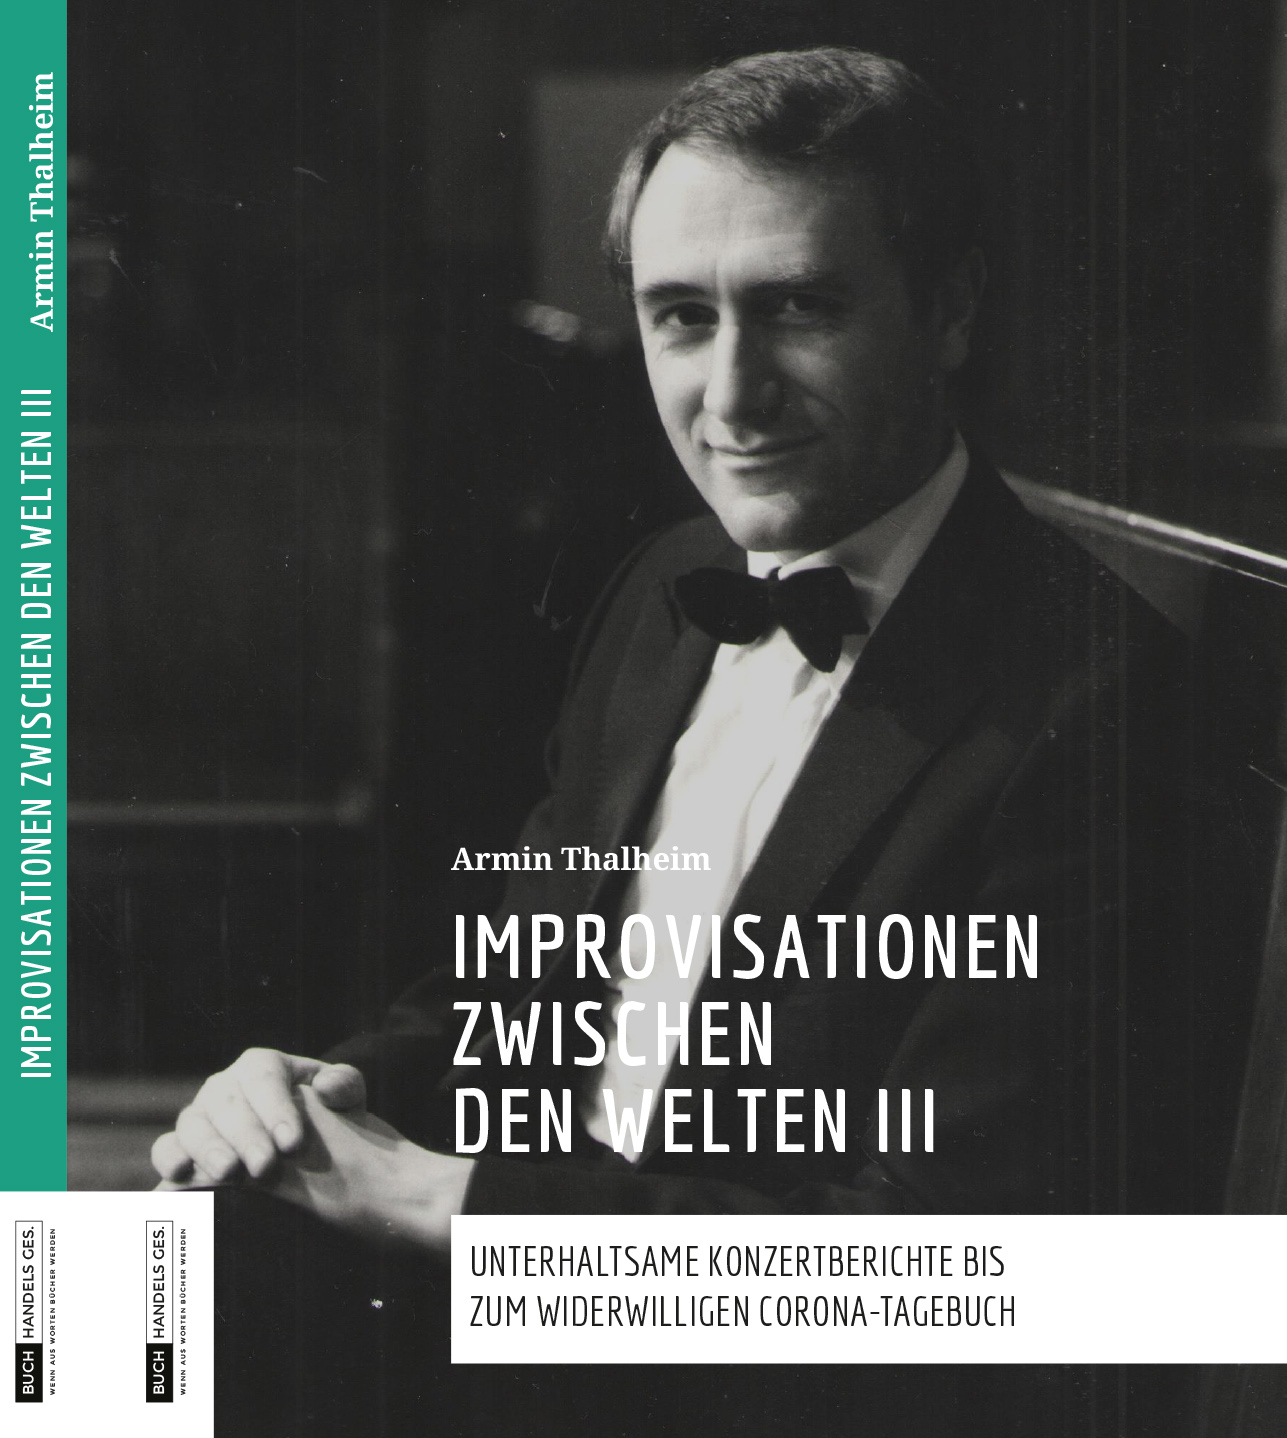 B045-Thalheim-Biografie_3_Cover